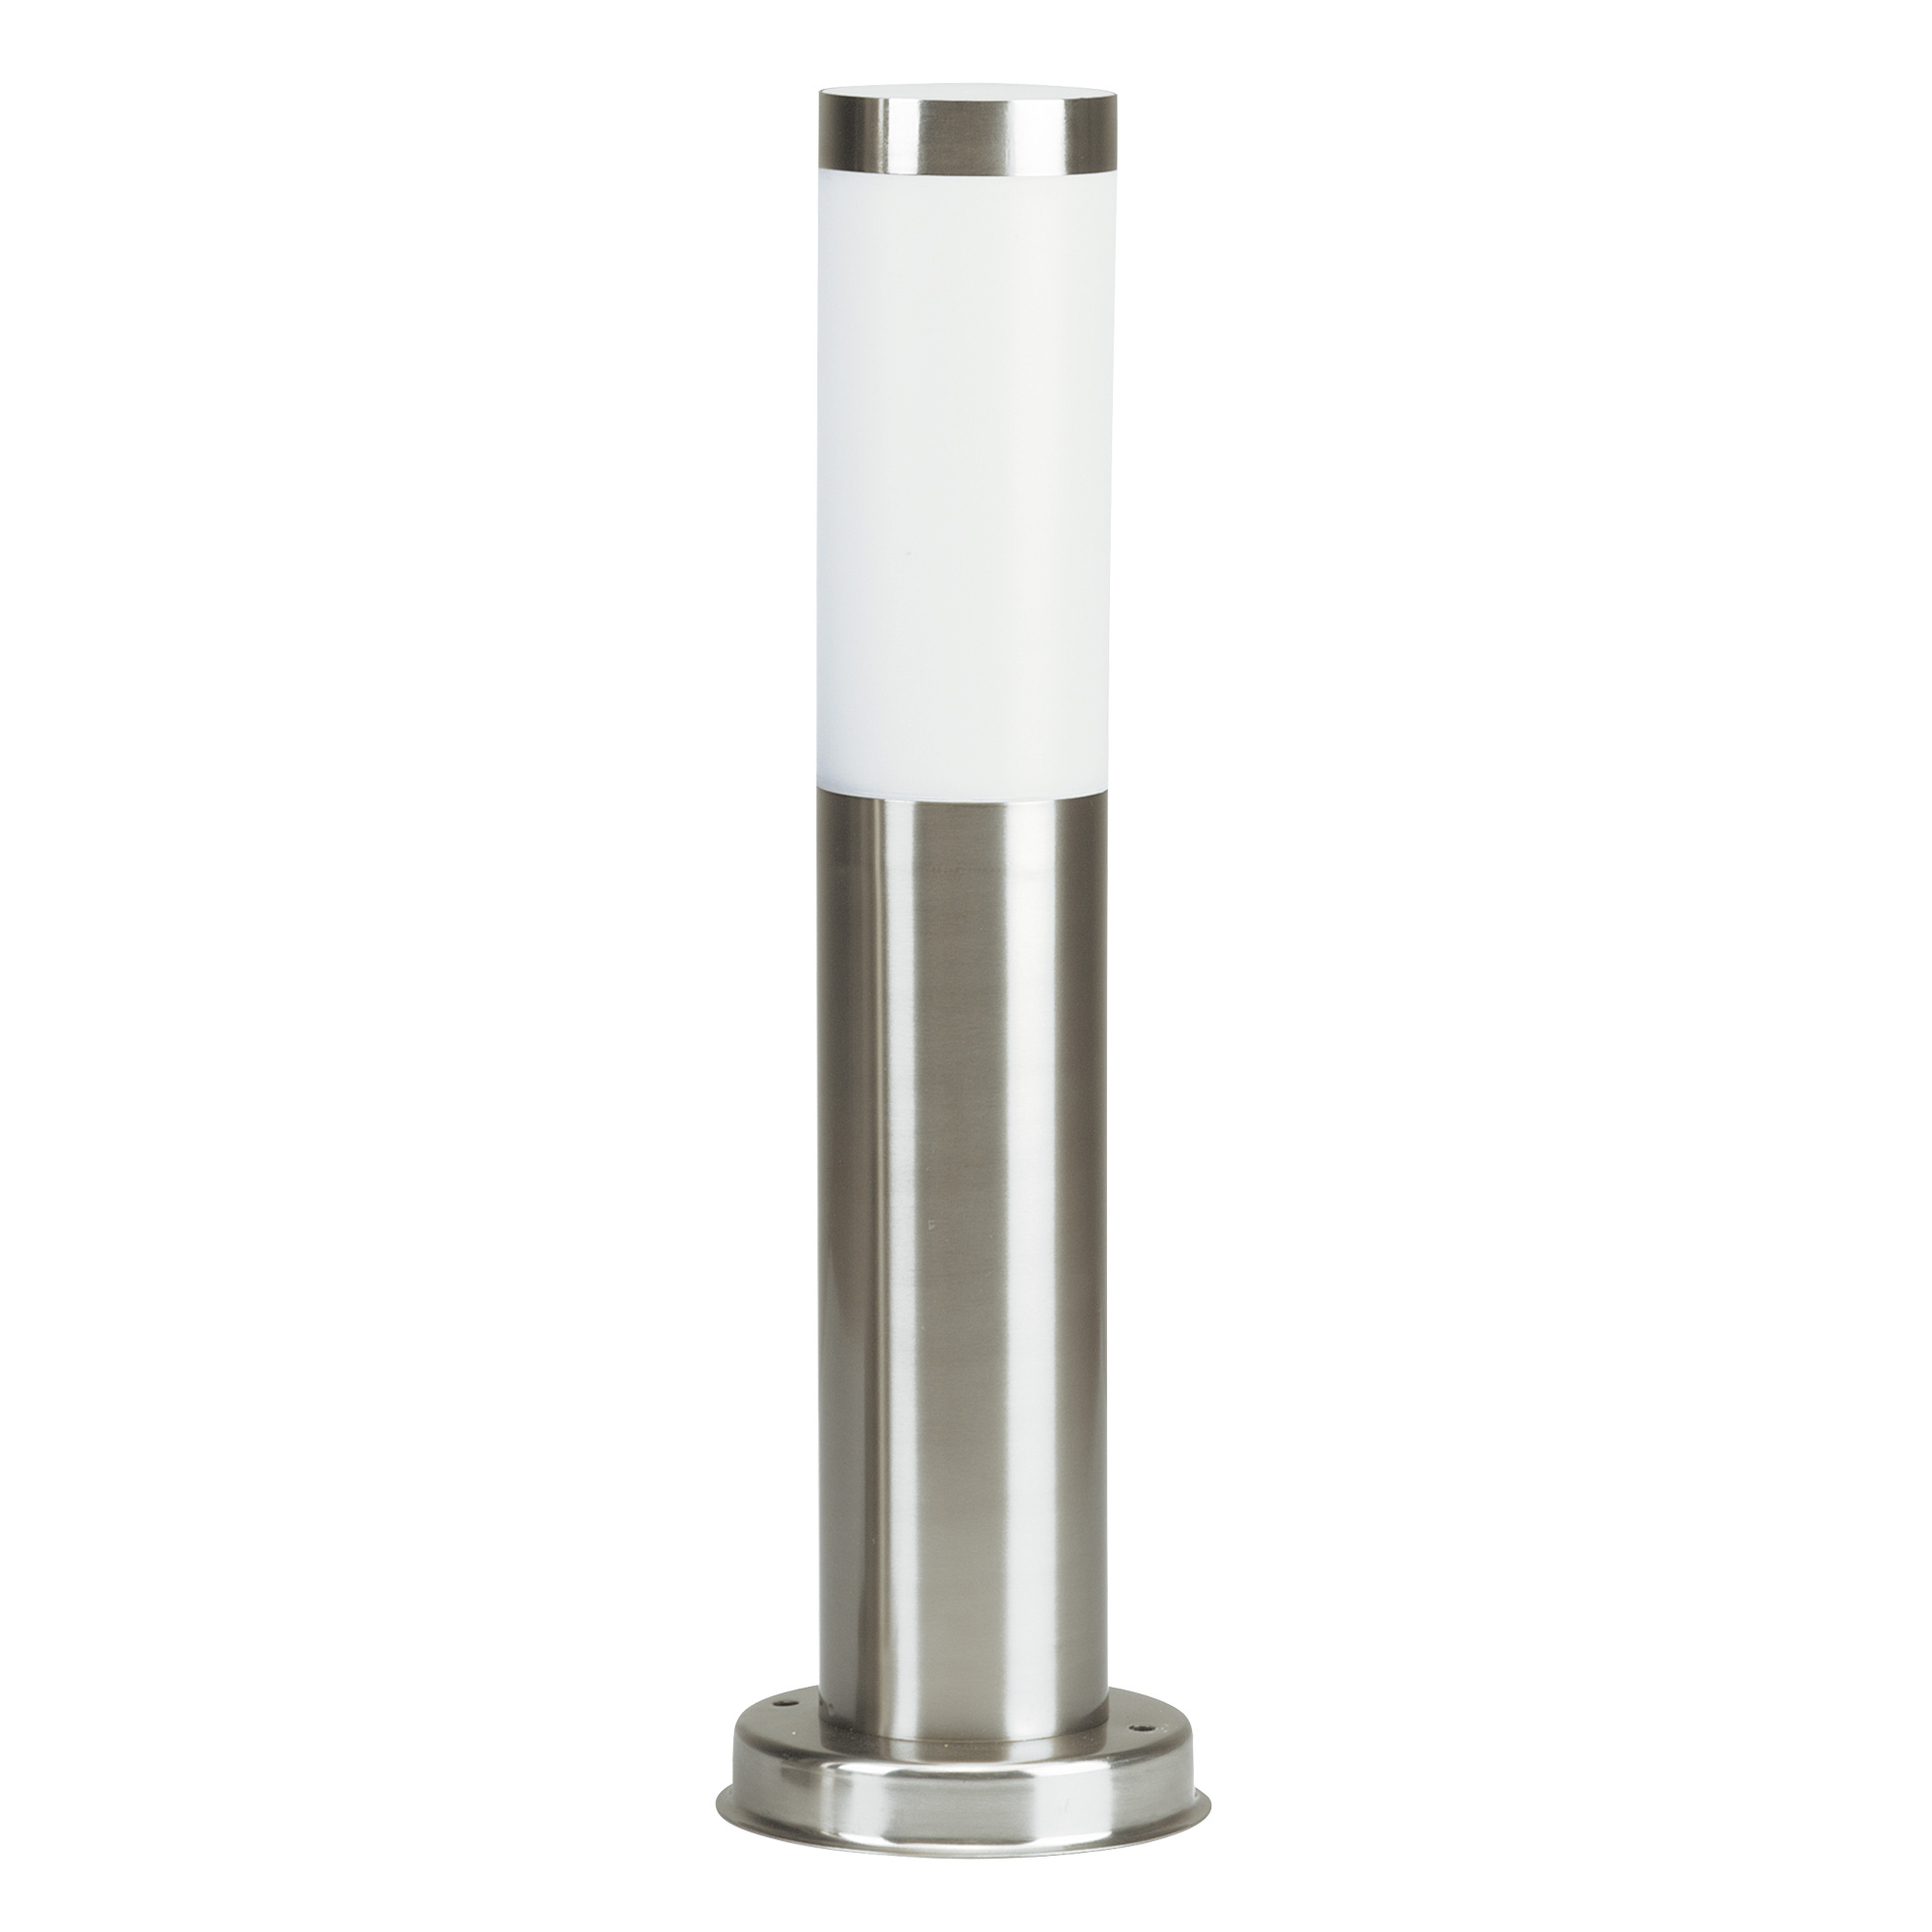 Tuinlamp RVS Lech 3